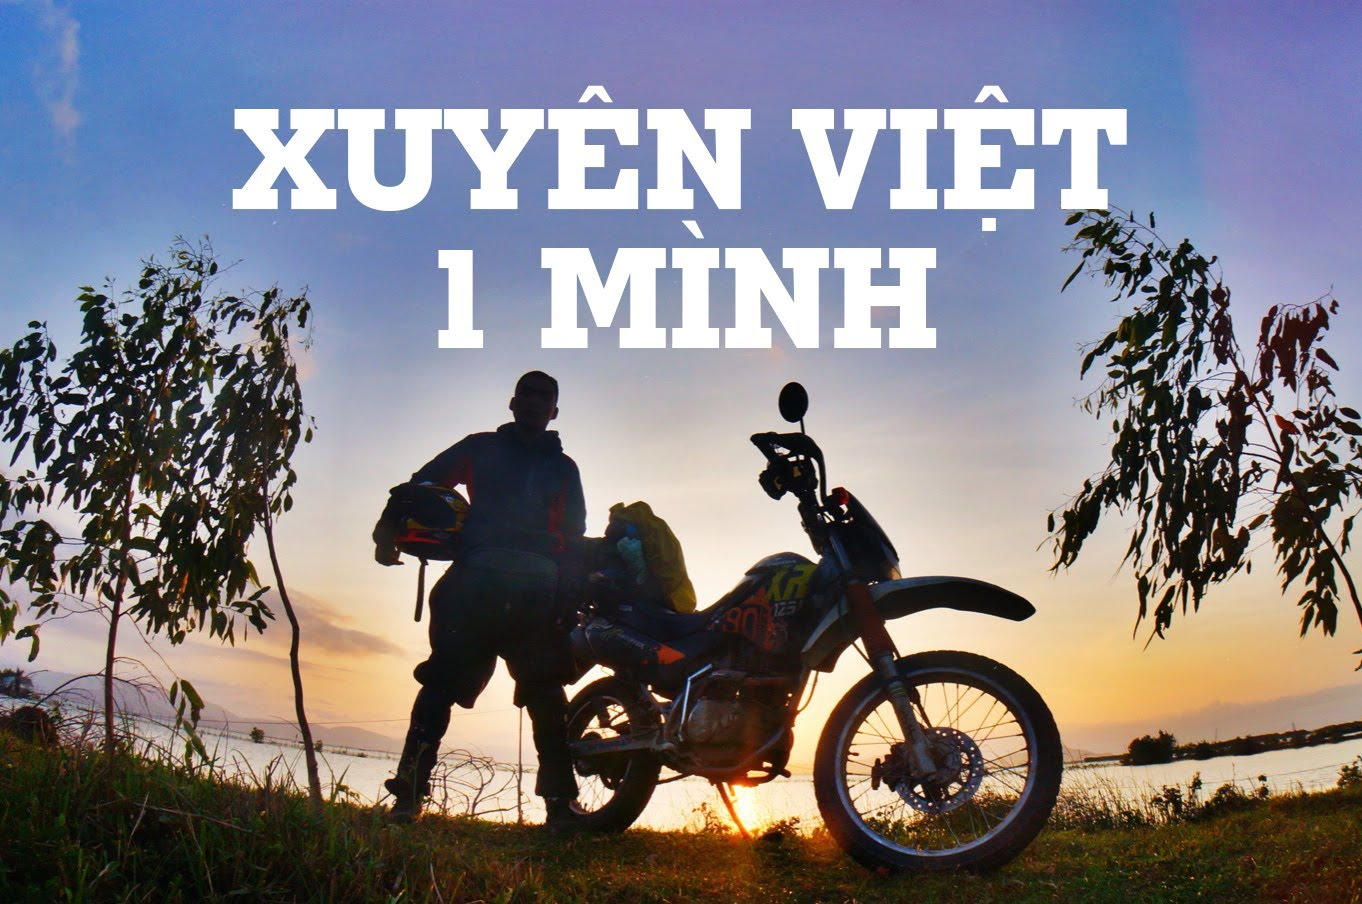 phuot-xuyen-viet-1-minh